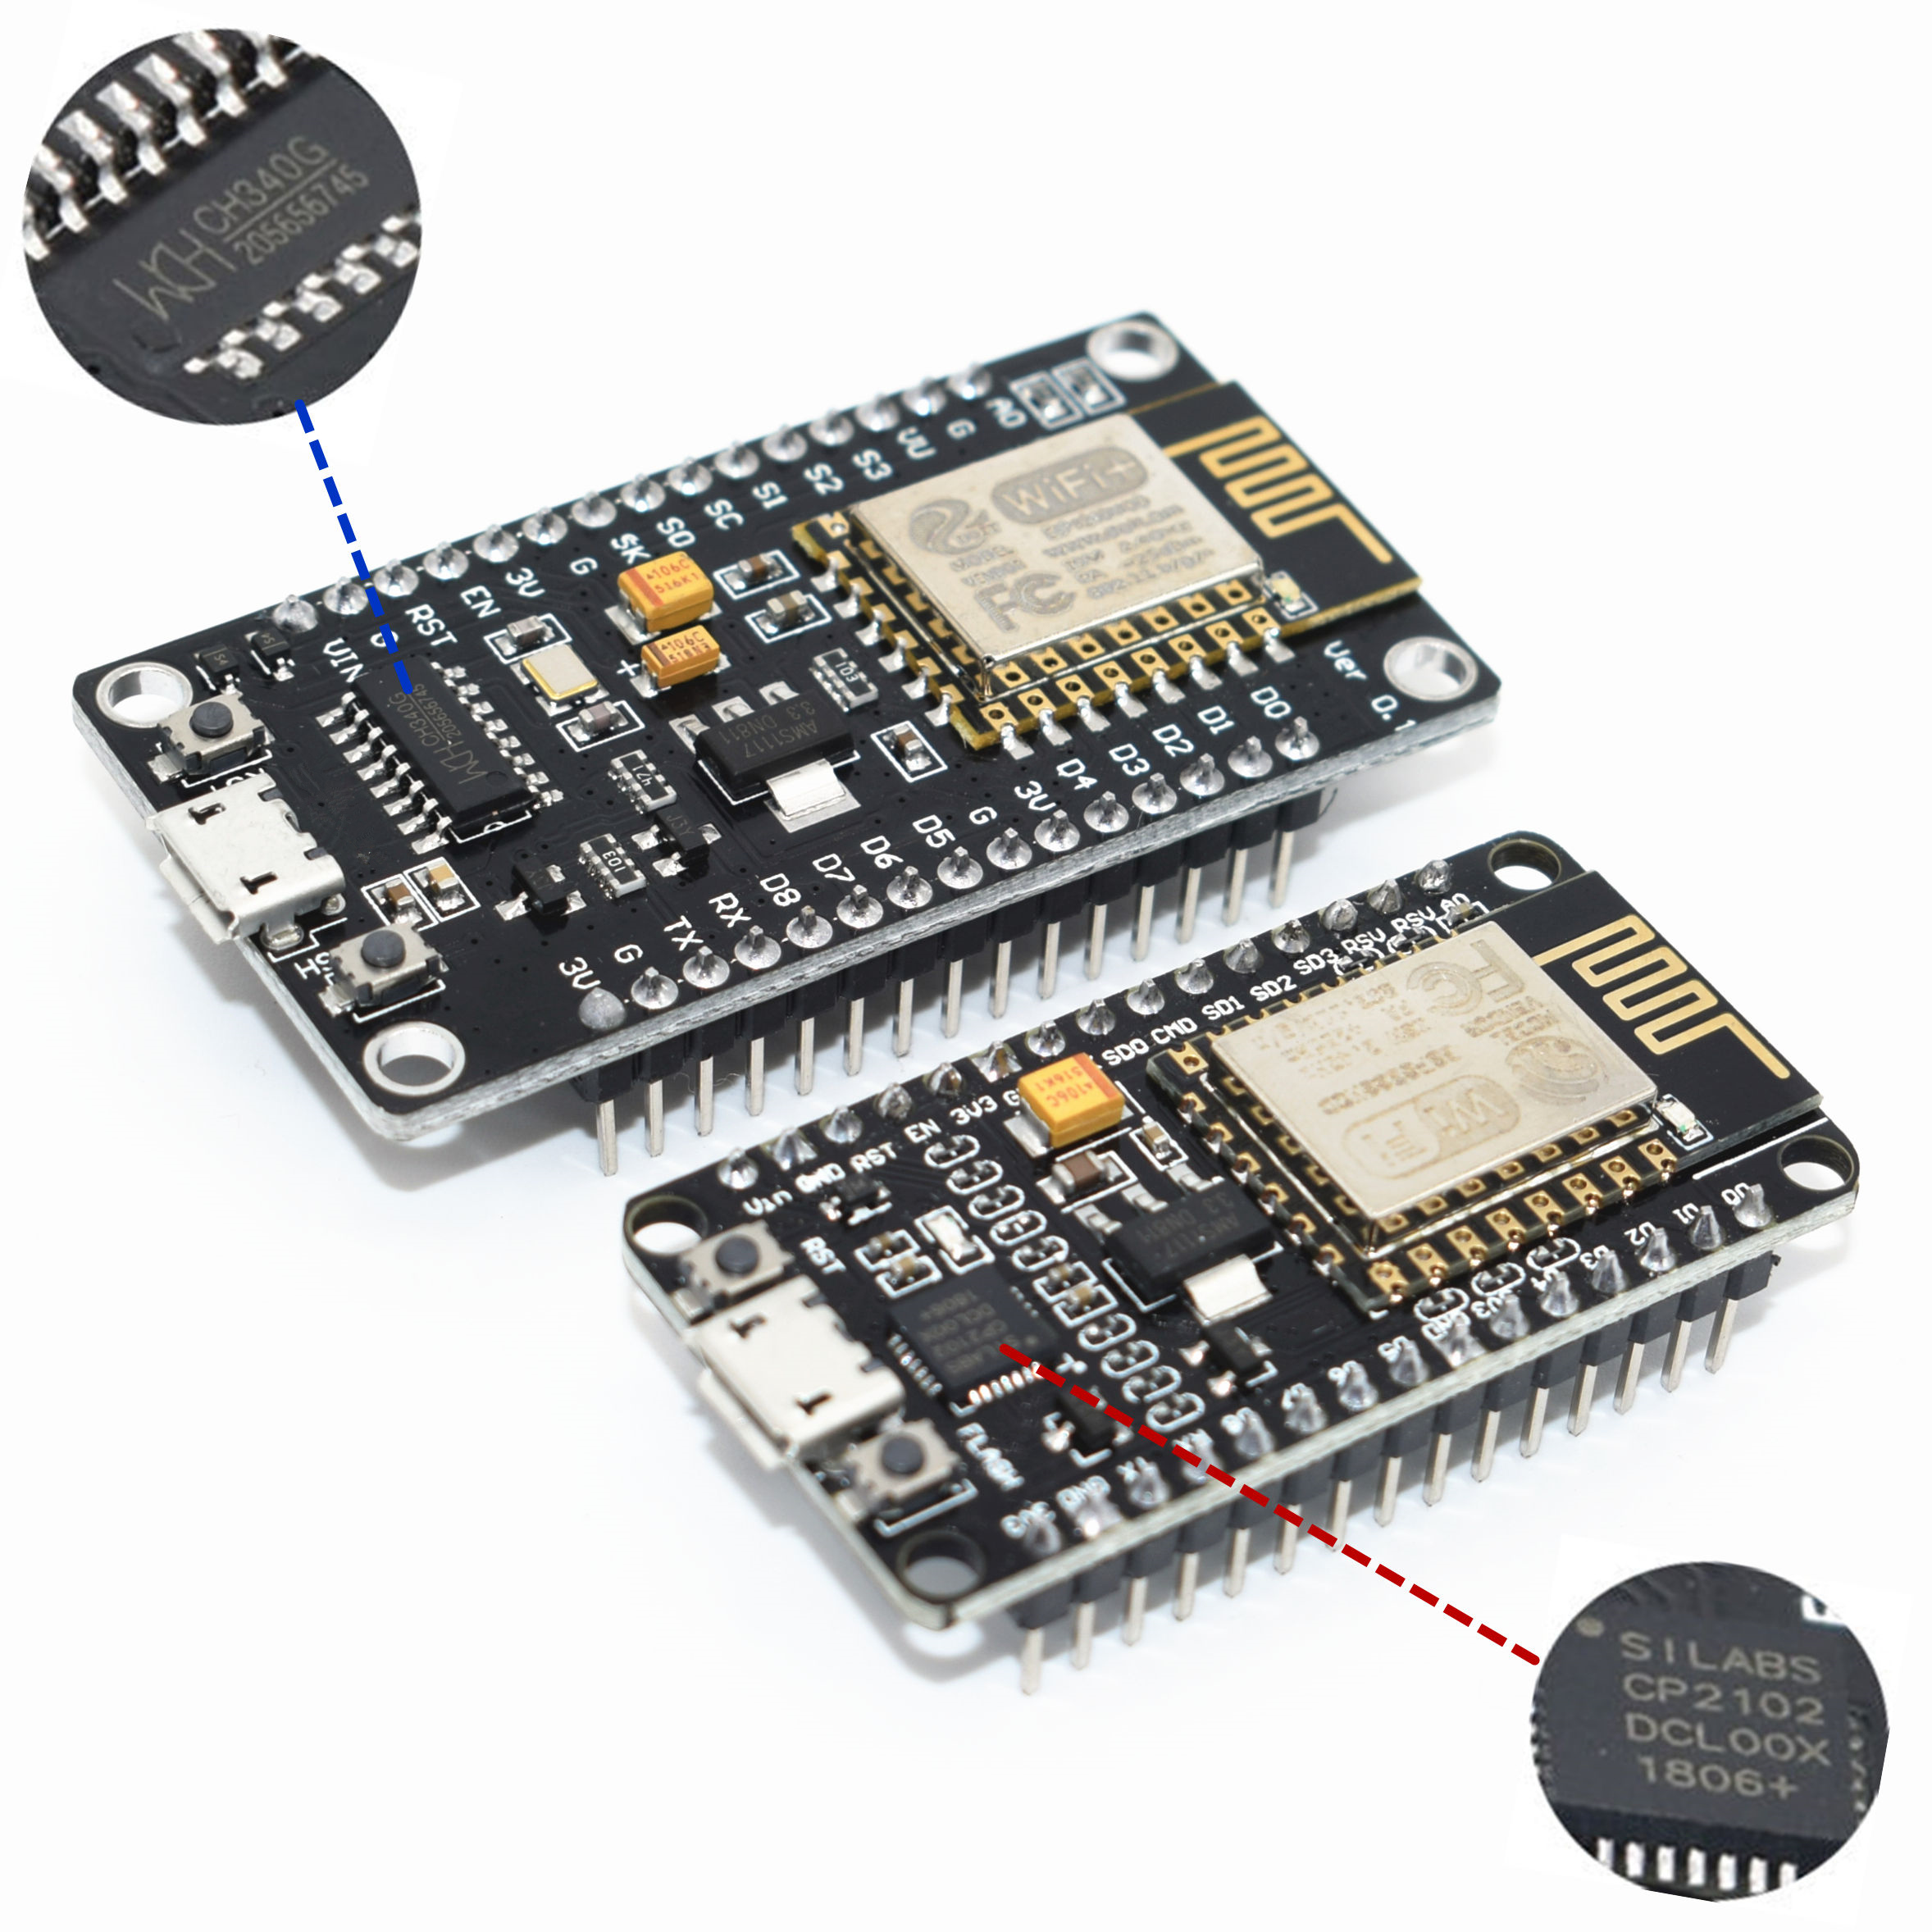 Wireless Module CH340/CP2102 NodeMcu V3 V2 Lua WIFI Internet Of Things Development Board Based ESP8266 ESP-12F With Pcb Antenna(China)